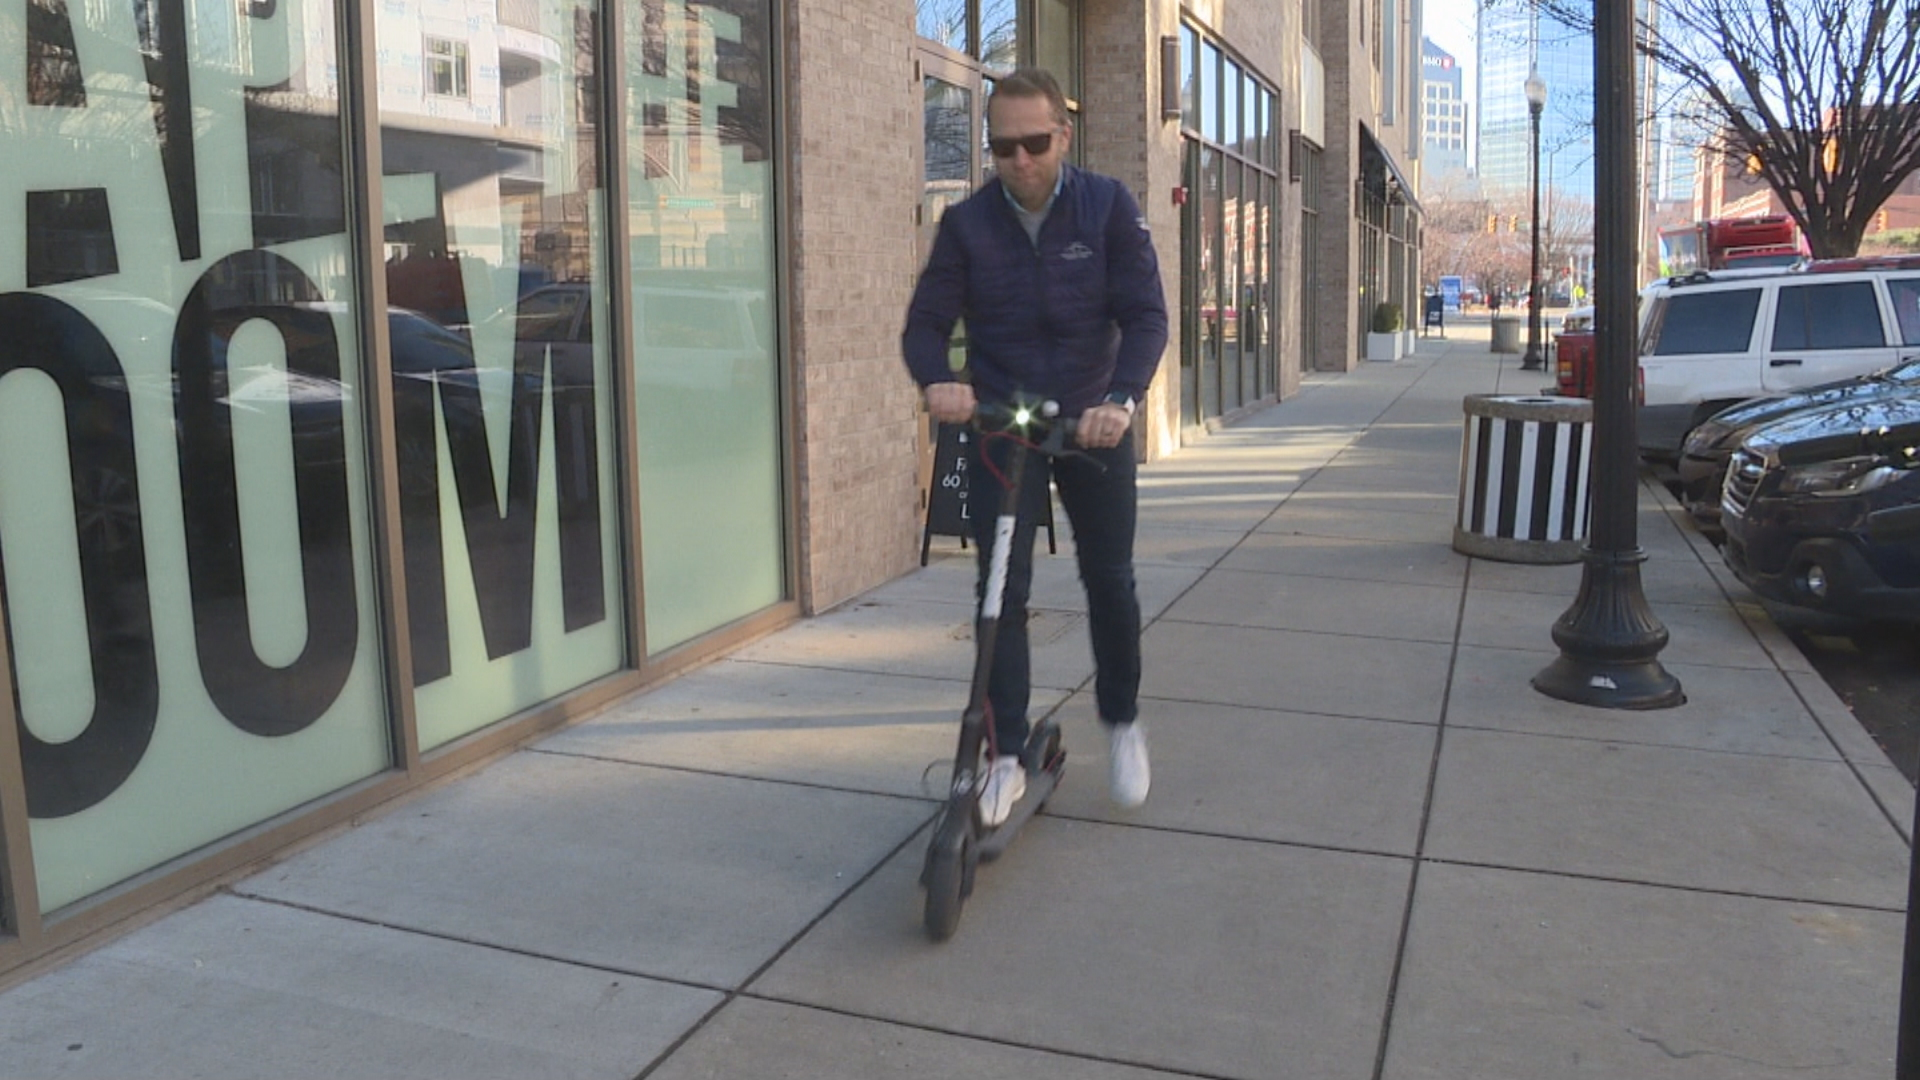 Indiana lawmaker wants scooter regulation